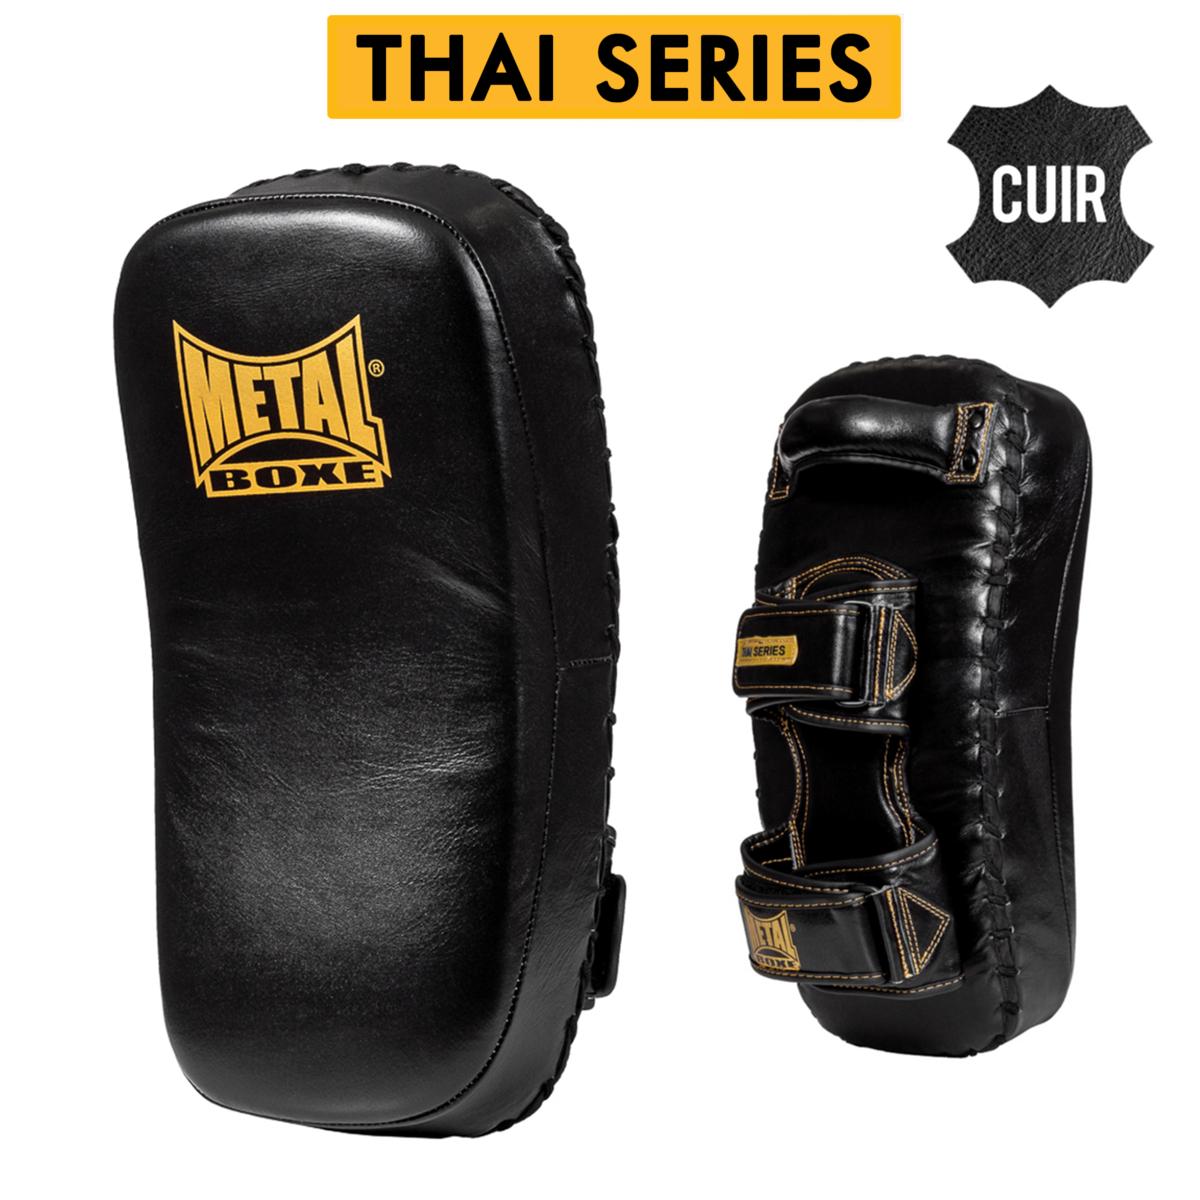 Pao Thaï séries en cuir Métal boxe